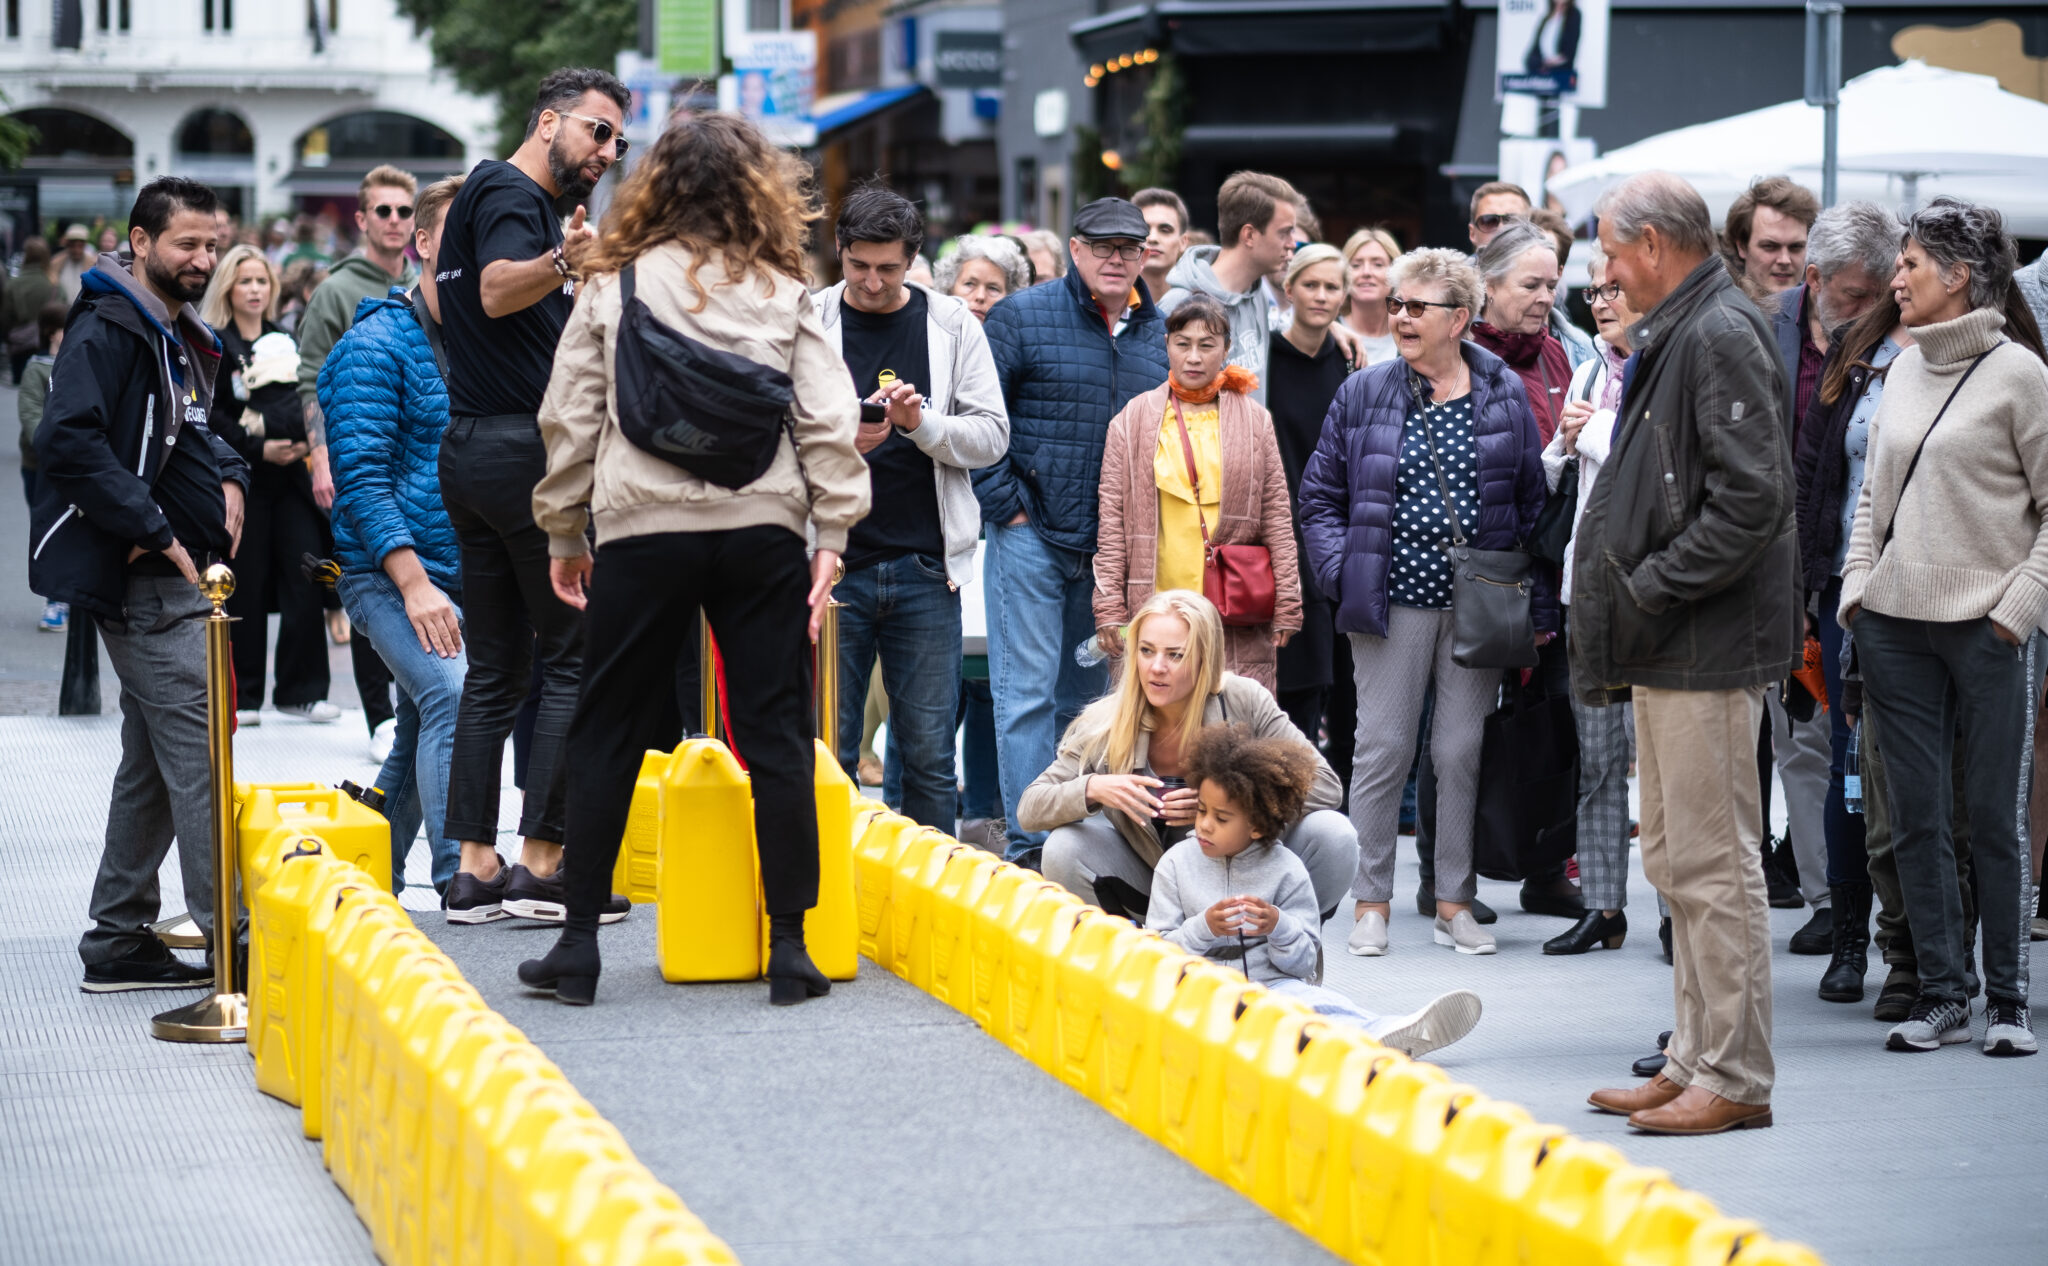 VORES WATER WALK EVENT VAR EN KÆMPE SUCCES!